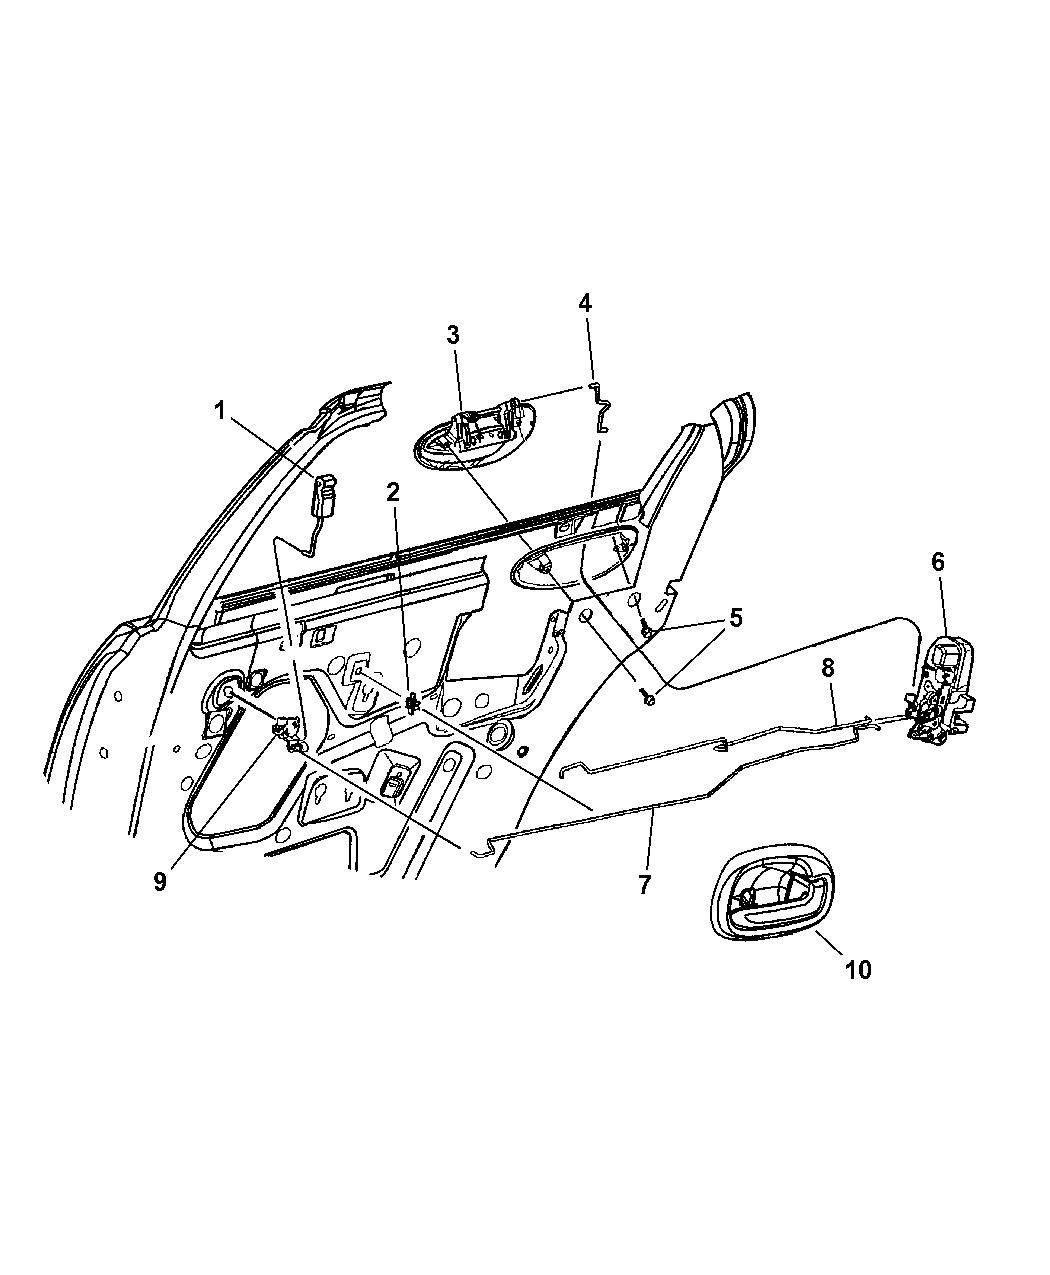 2001 Chrysler Sebring Sedan & Convertible Rear Door